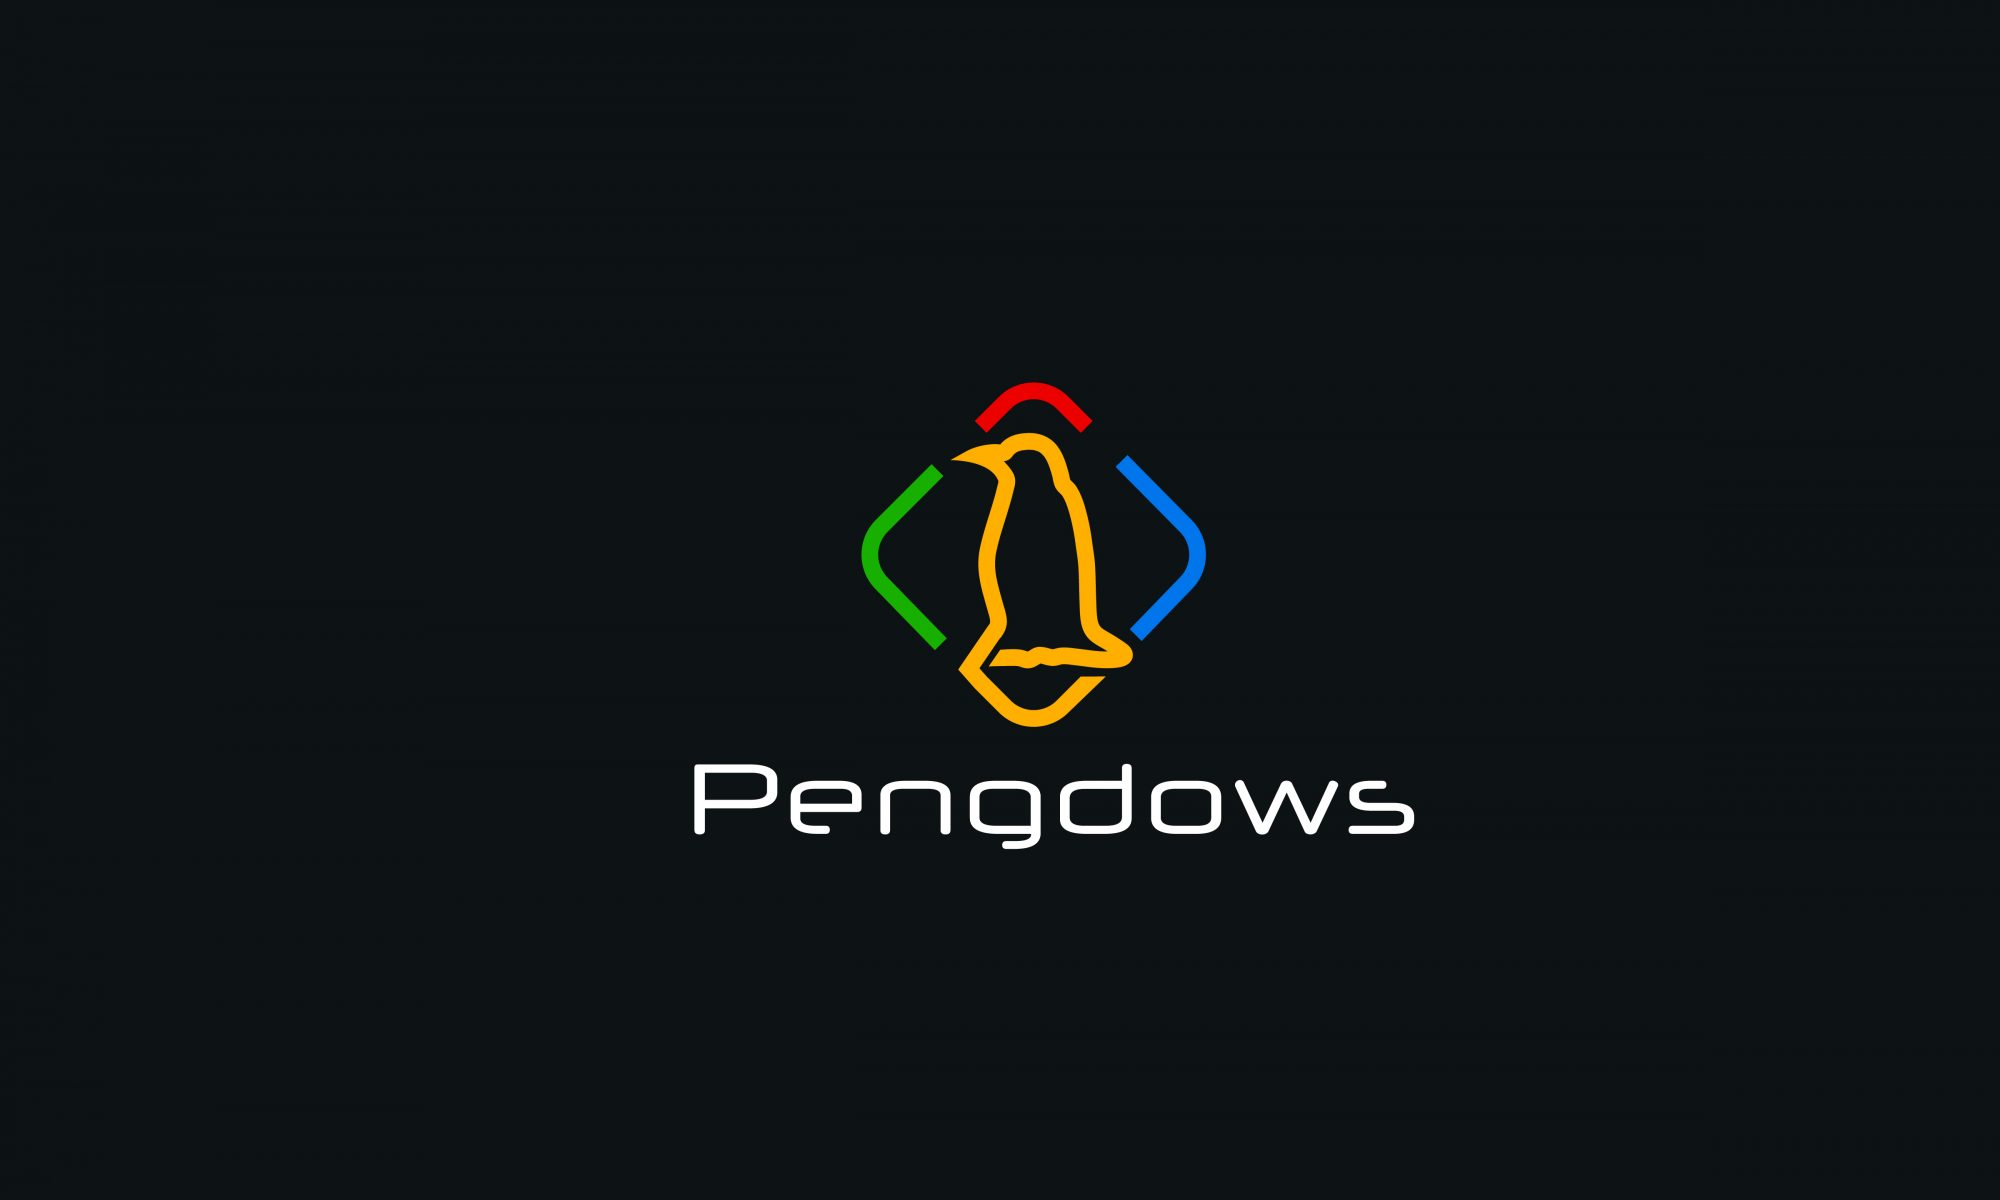 Pengdows